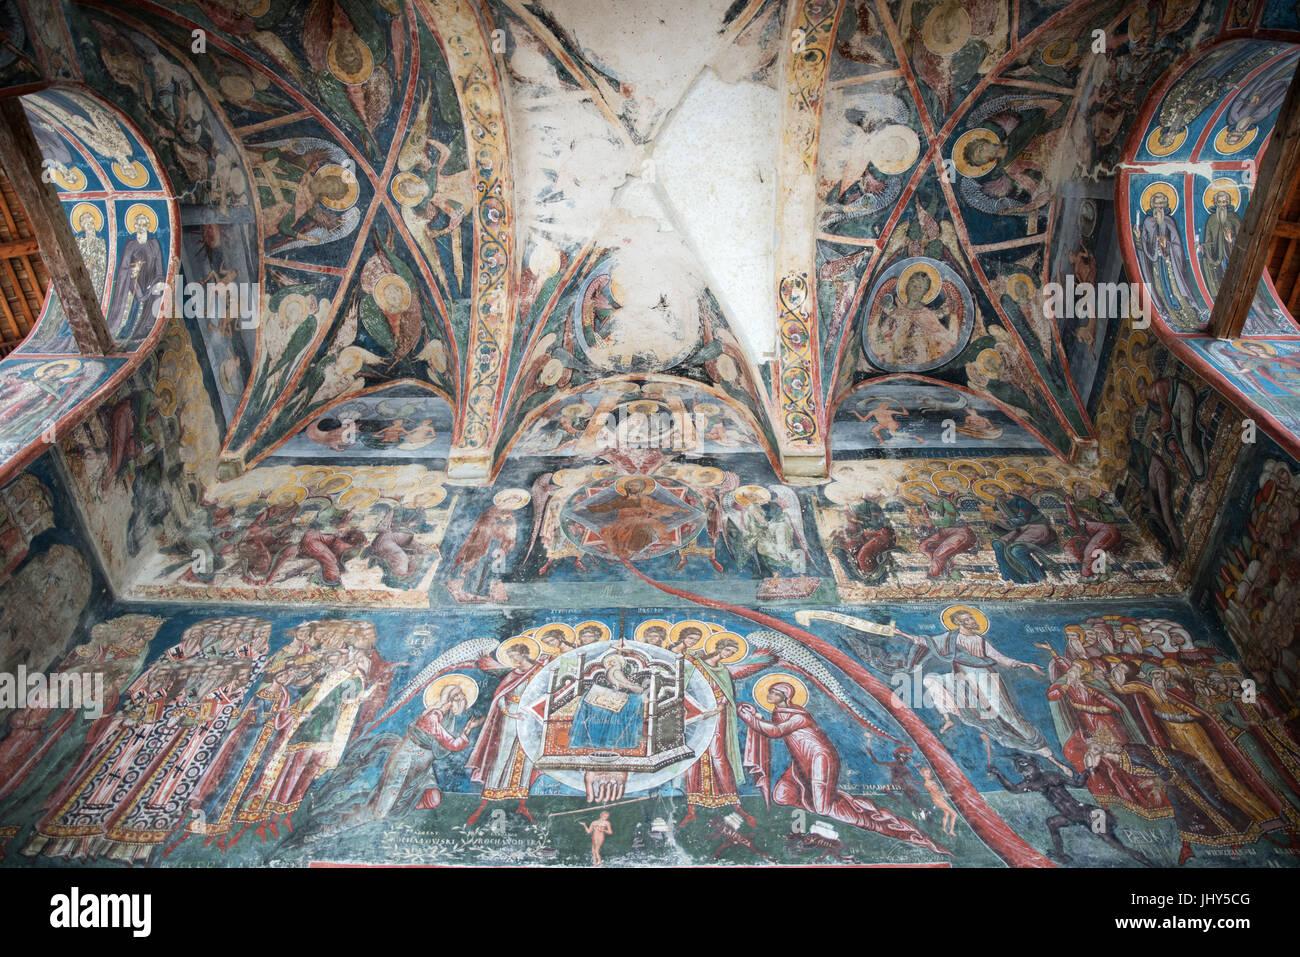 Frescoes on the ceilings of the Church of Moldovita Monastery, Romania - Stock Image